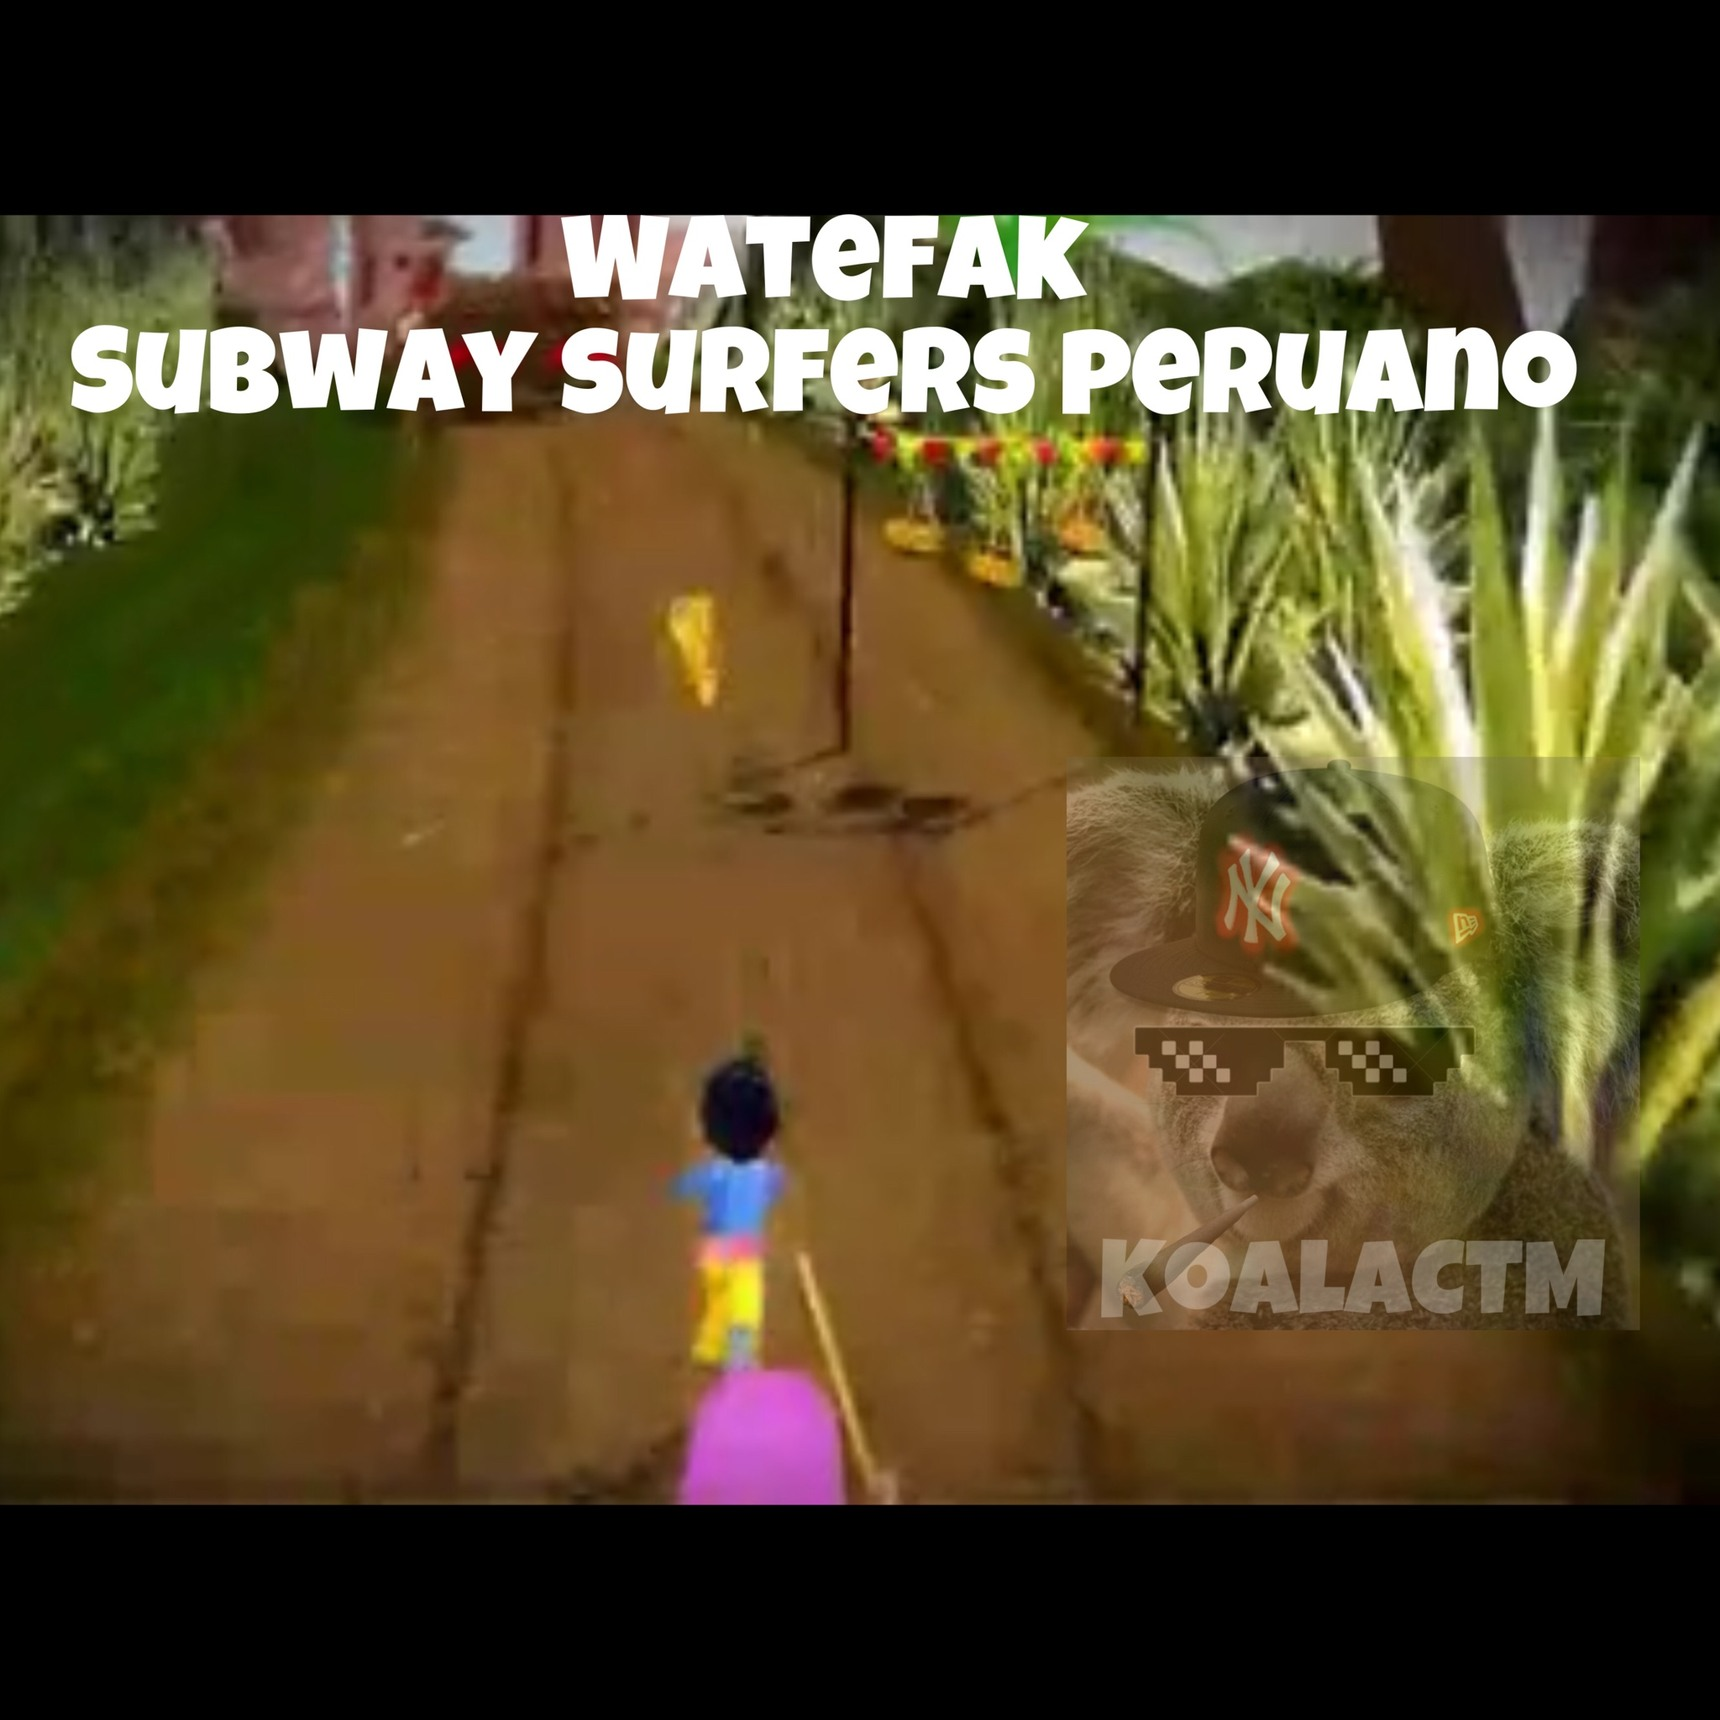 watefak ahora es peruano - meme